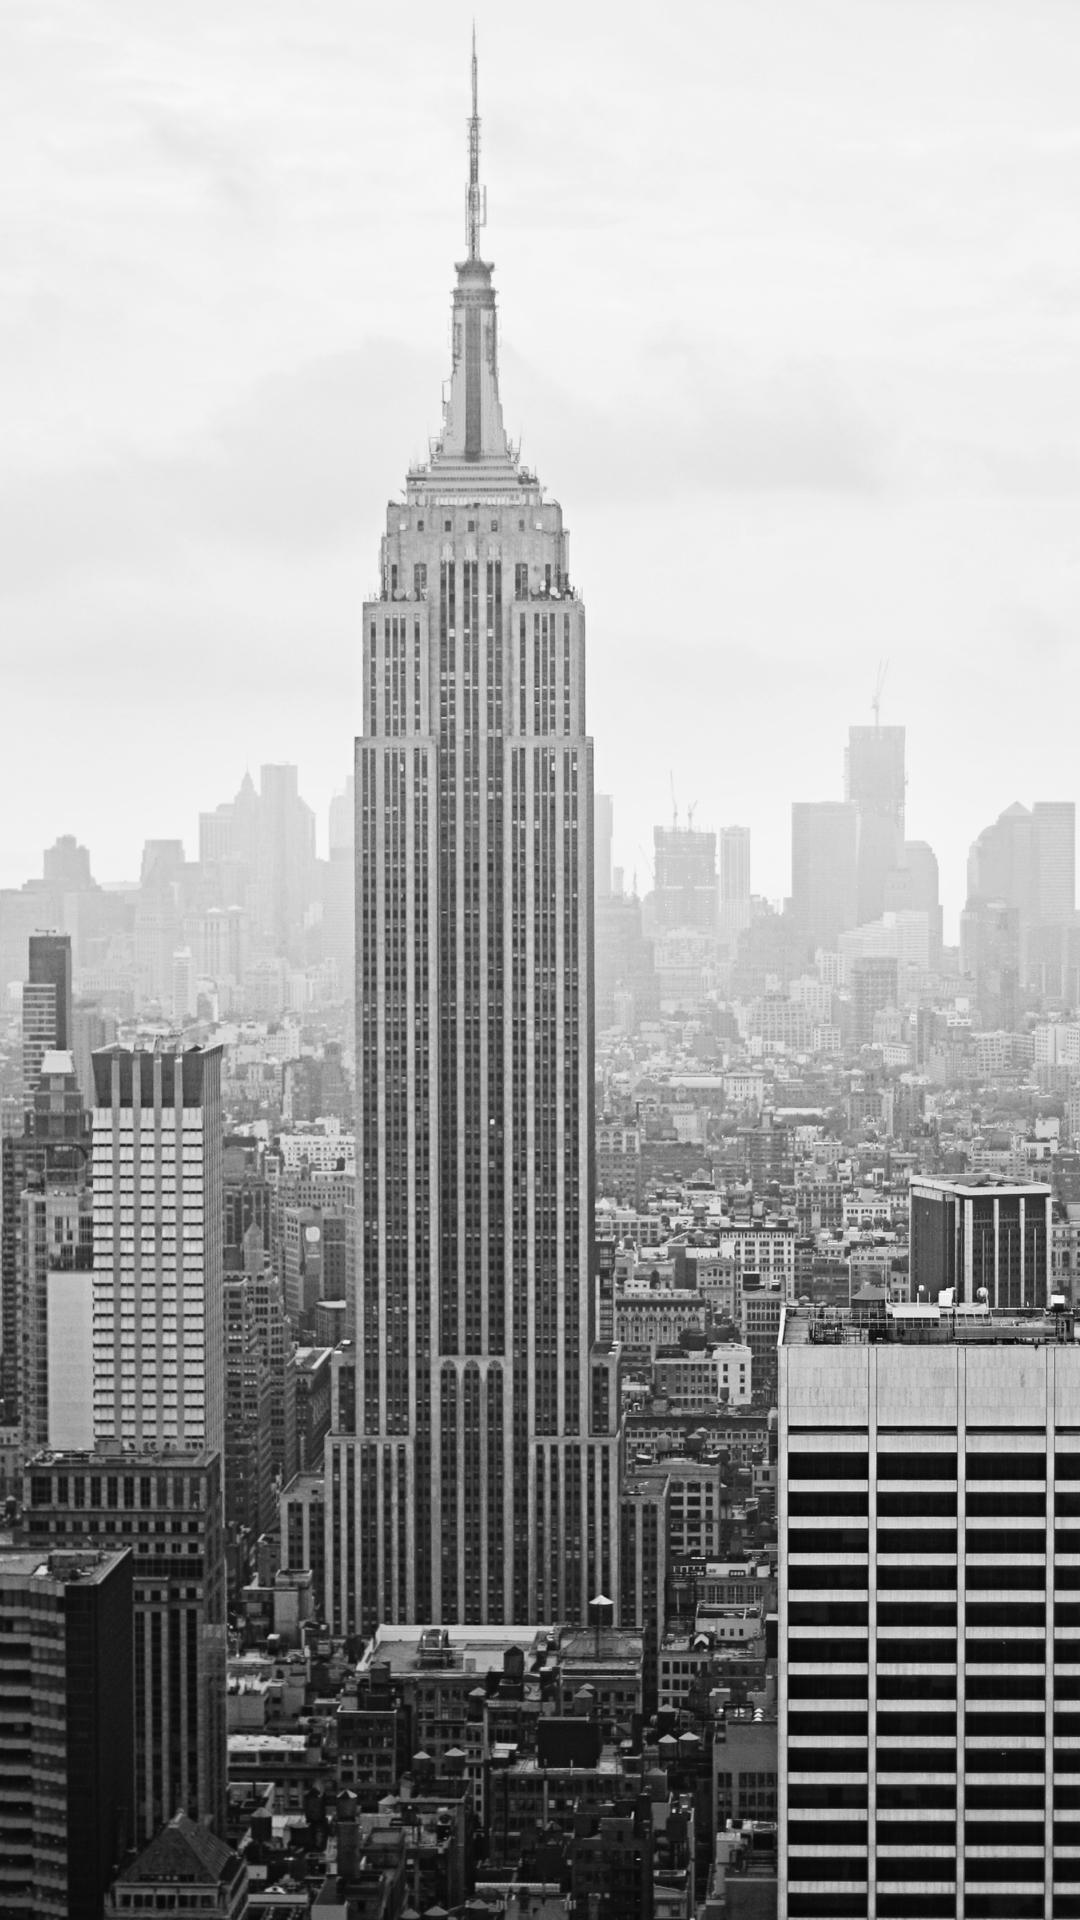 new york iphone wallpaper,city,skyscraper,metropolitan area,metropolis,cityscape